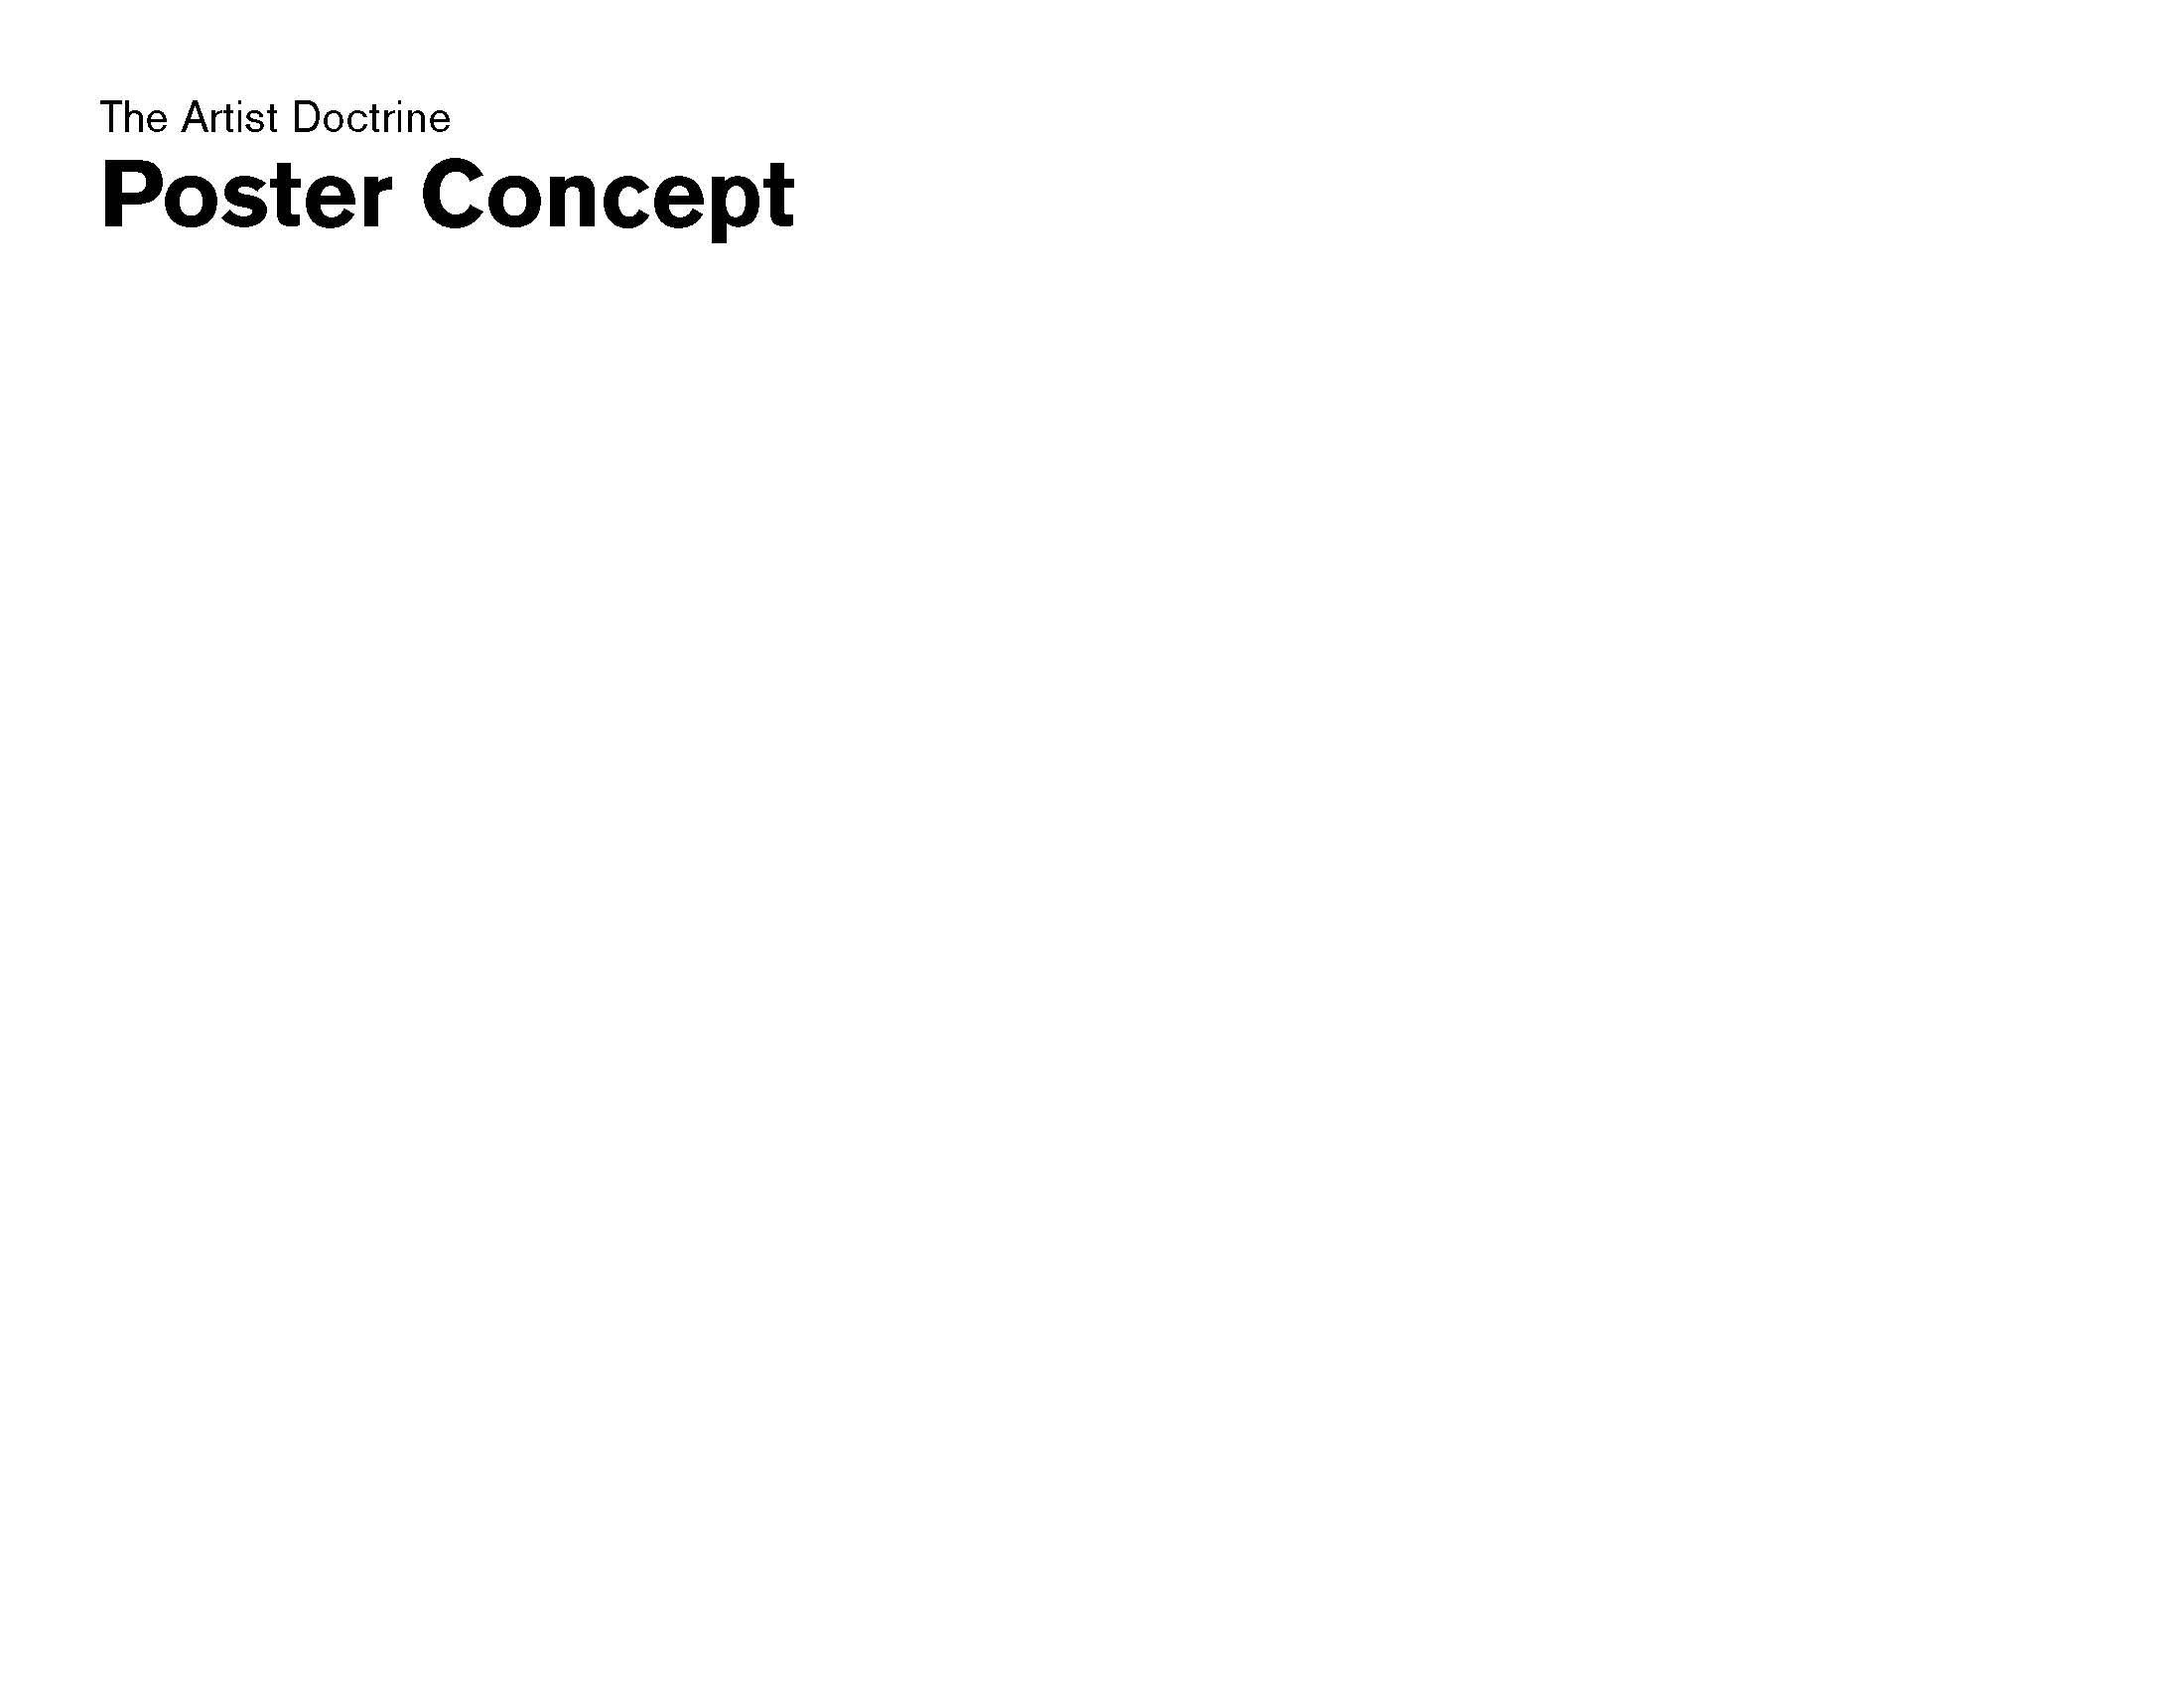 Poster-Concept-Artist-Doctrine_Page_1.jpg